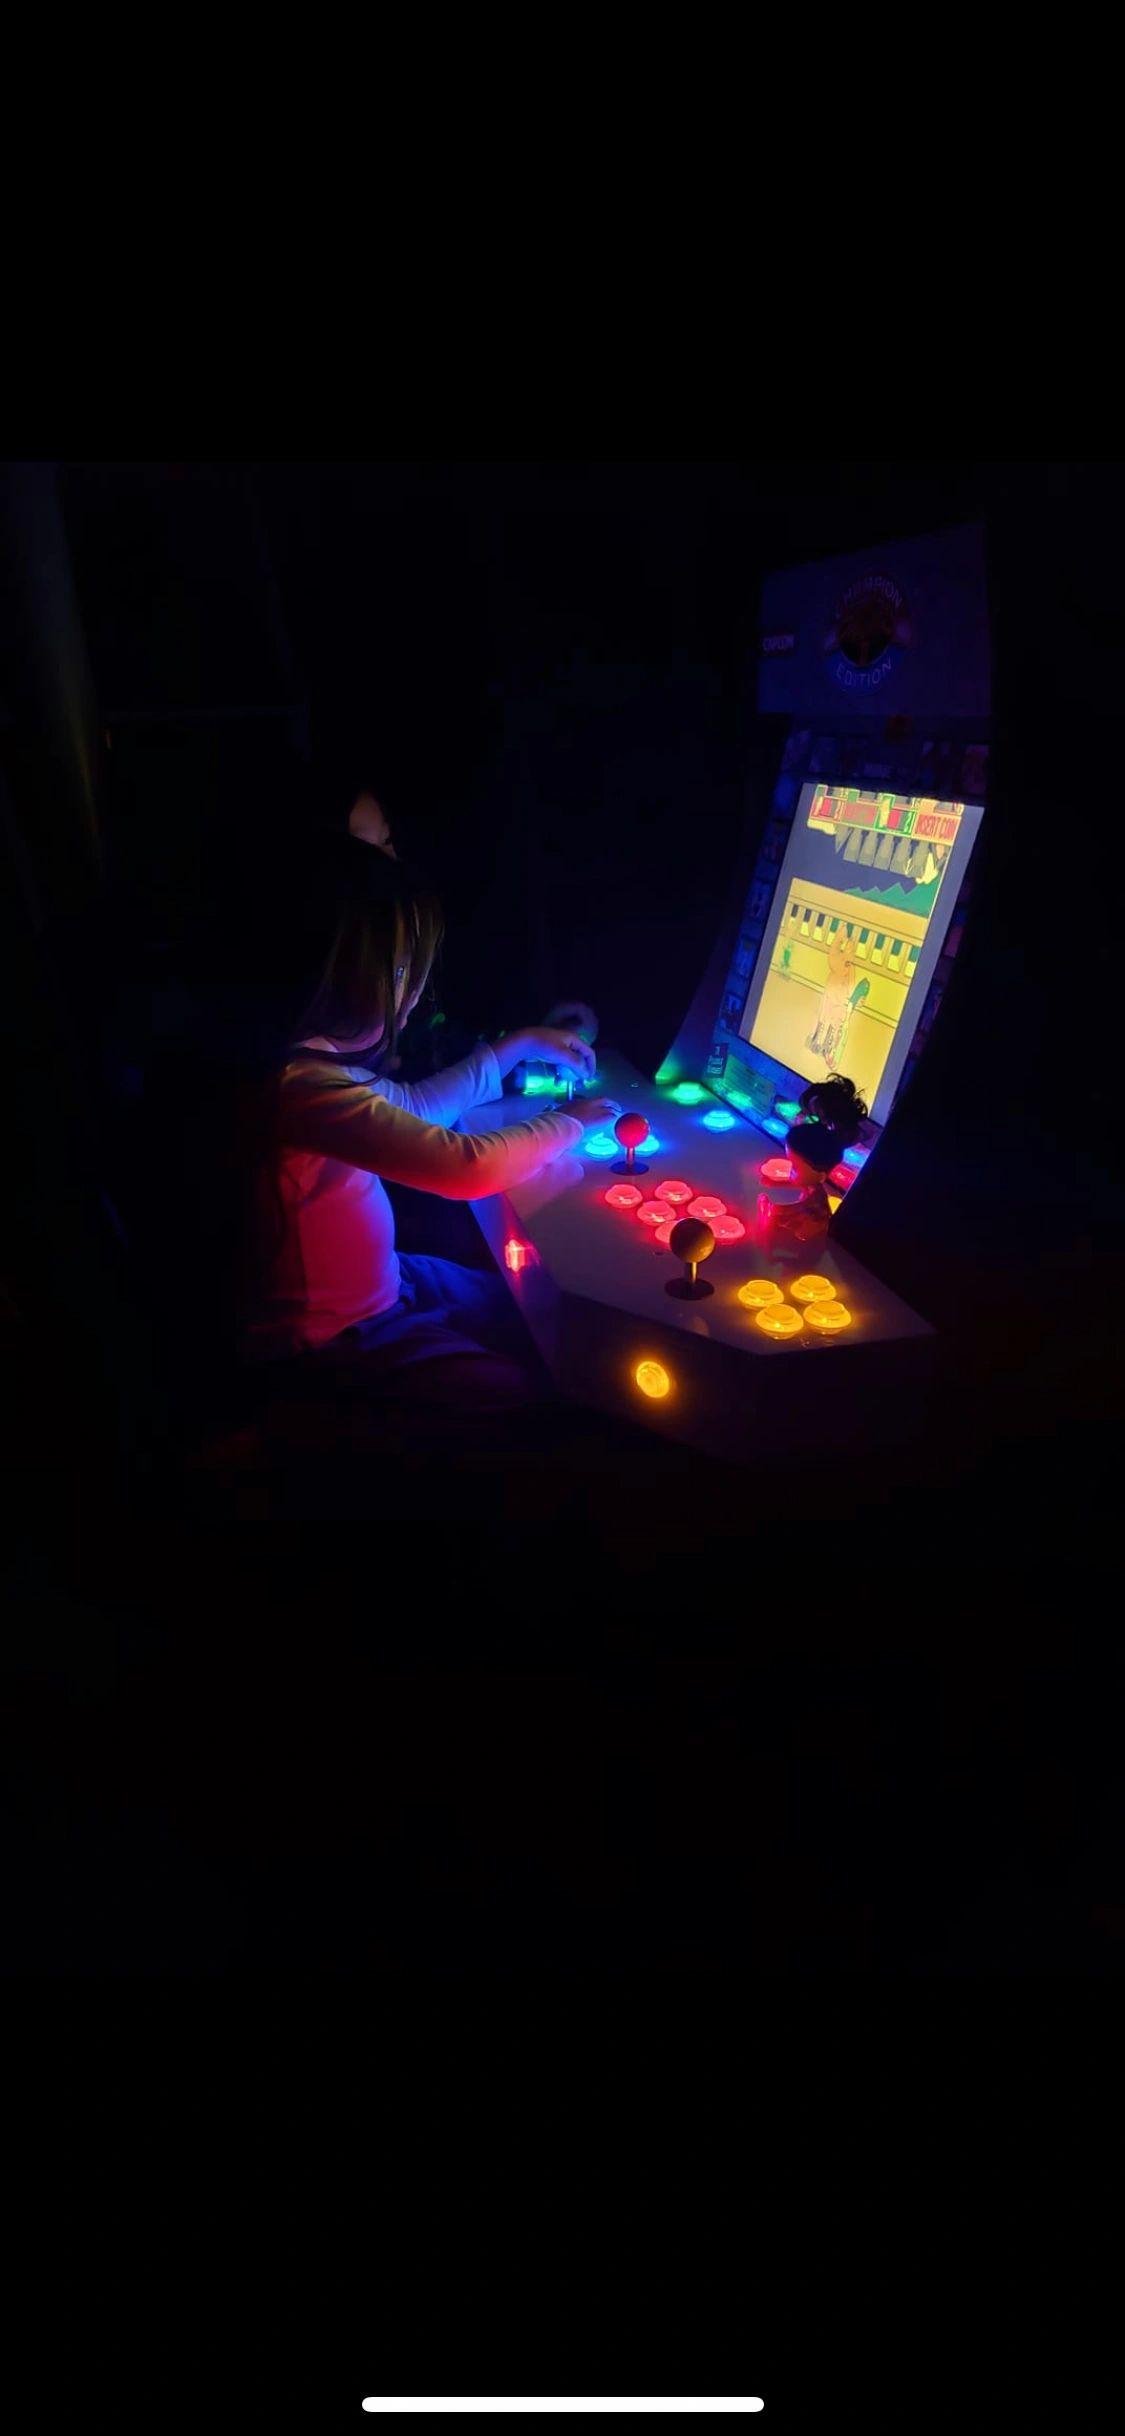 X-99 Lives Arcade - Arcade1up Upgrades, Games, Arcade Games